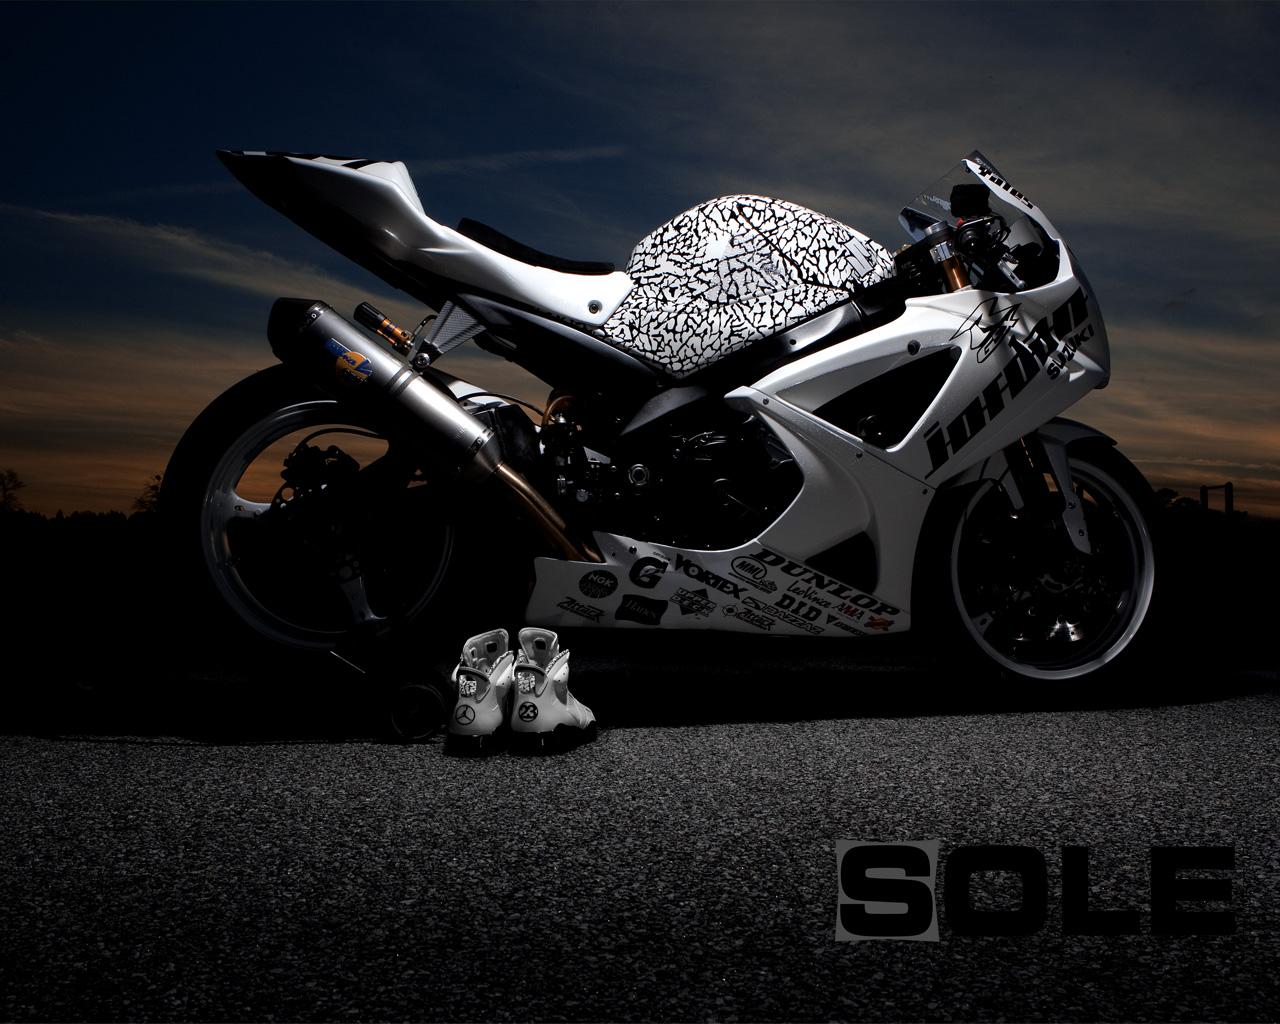 super popular e848d 463f7 In Context: The 'Motorsports' Air Jordan 6 | Sole Collector